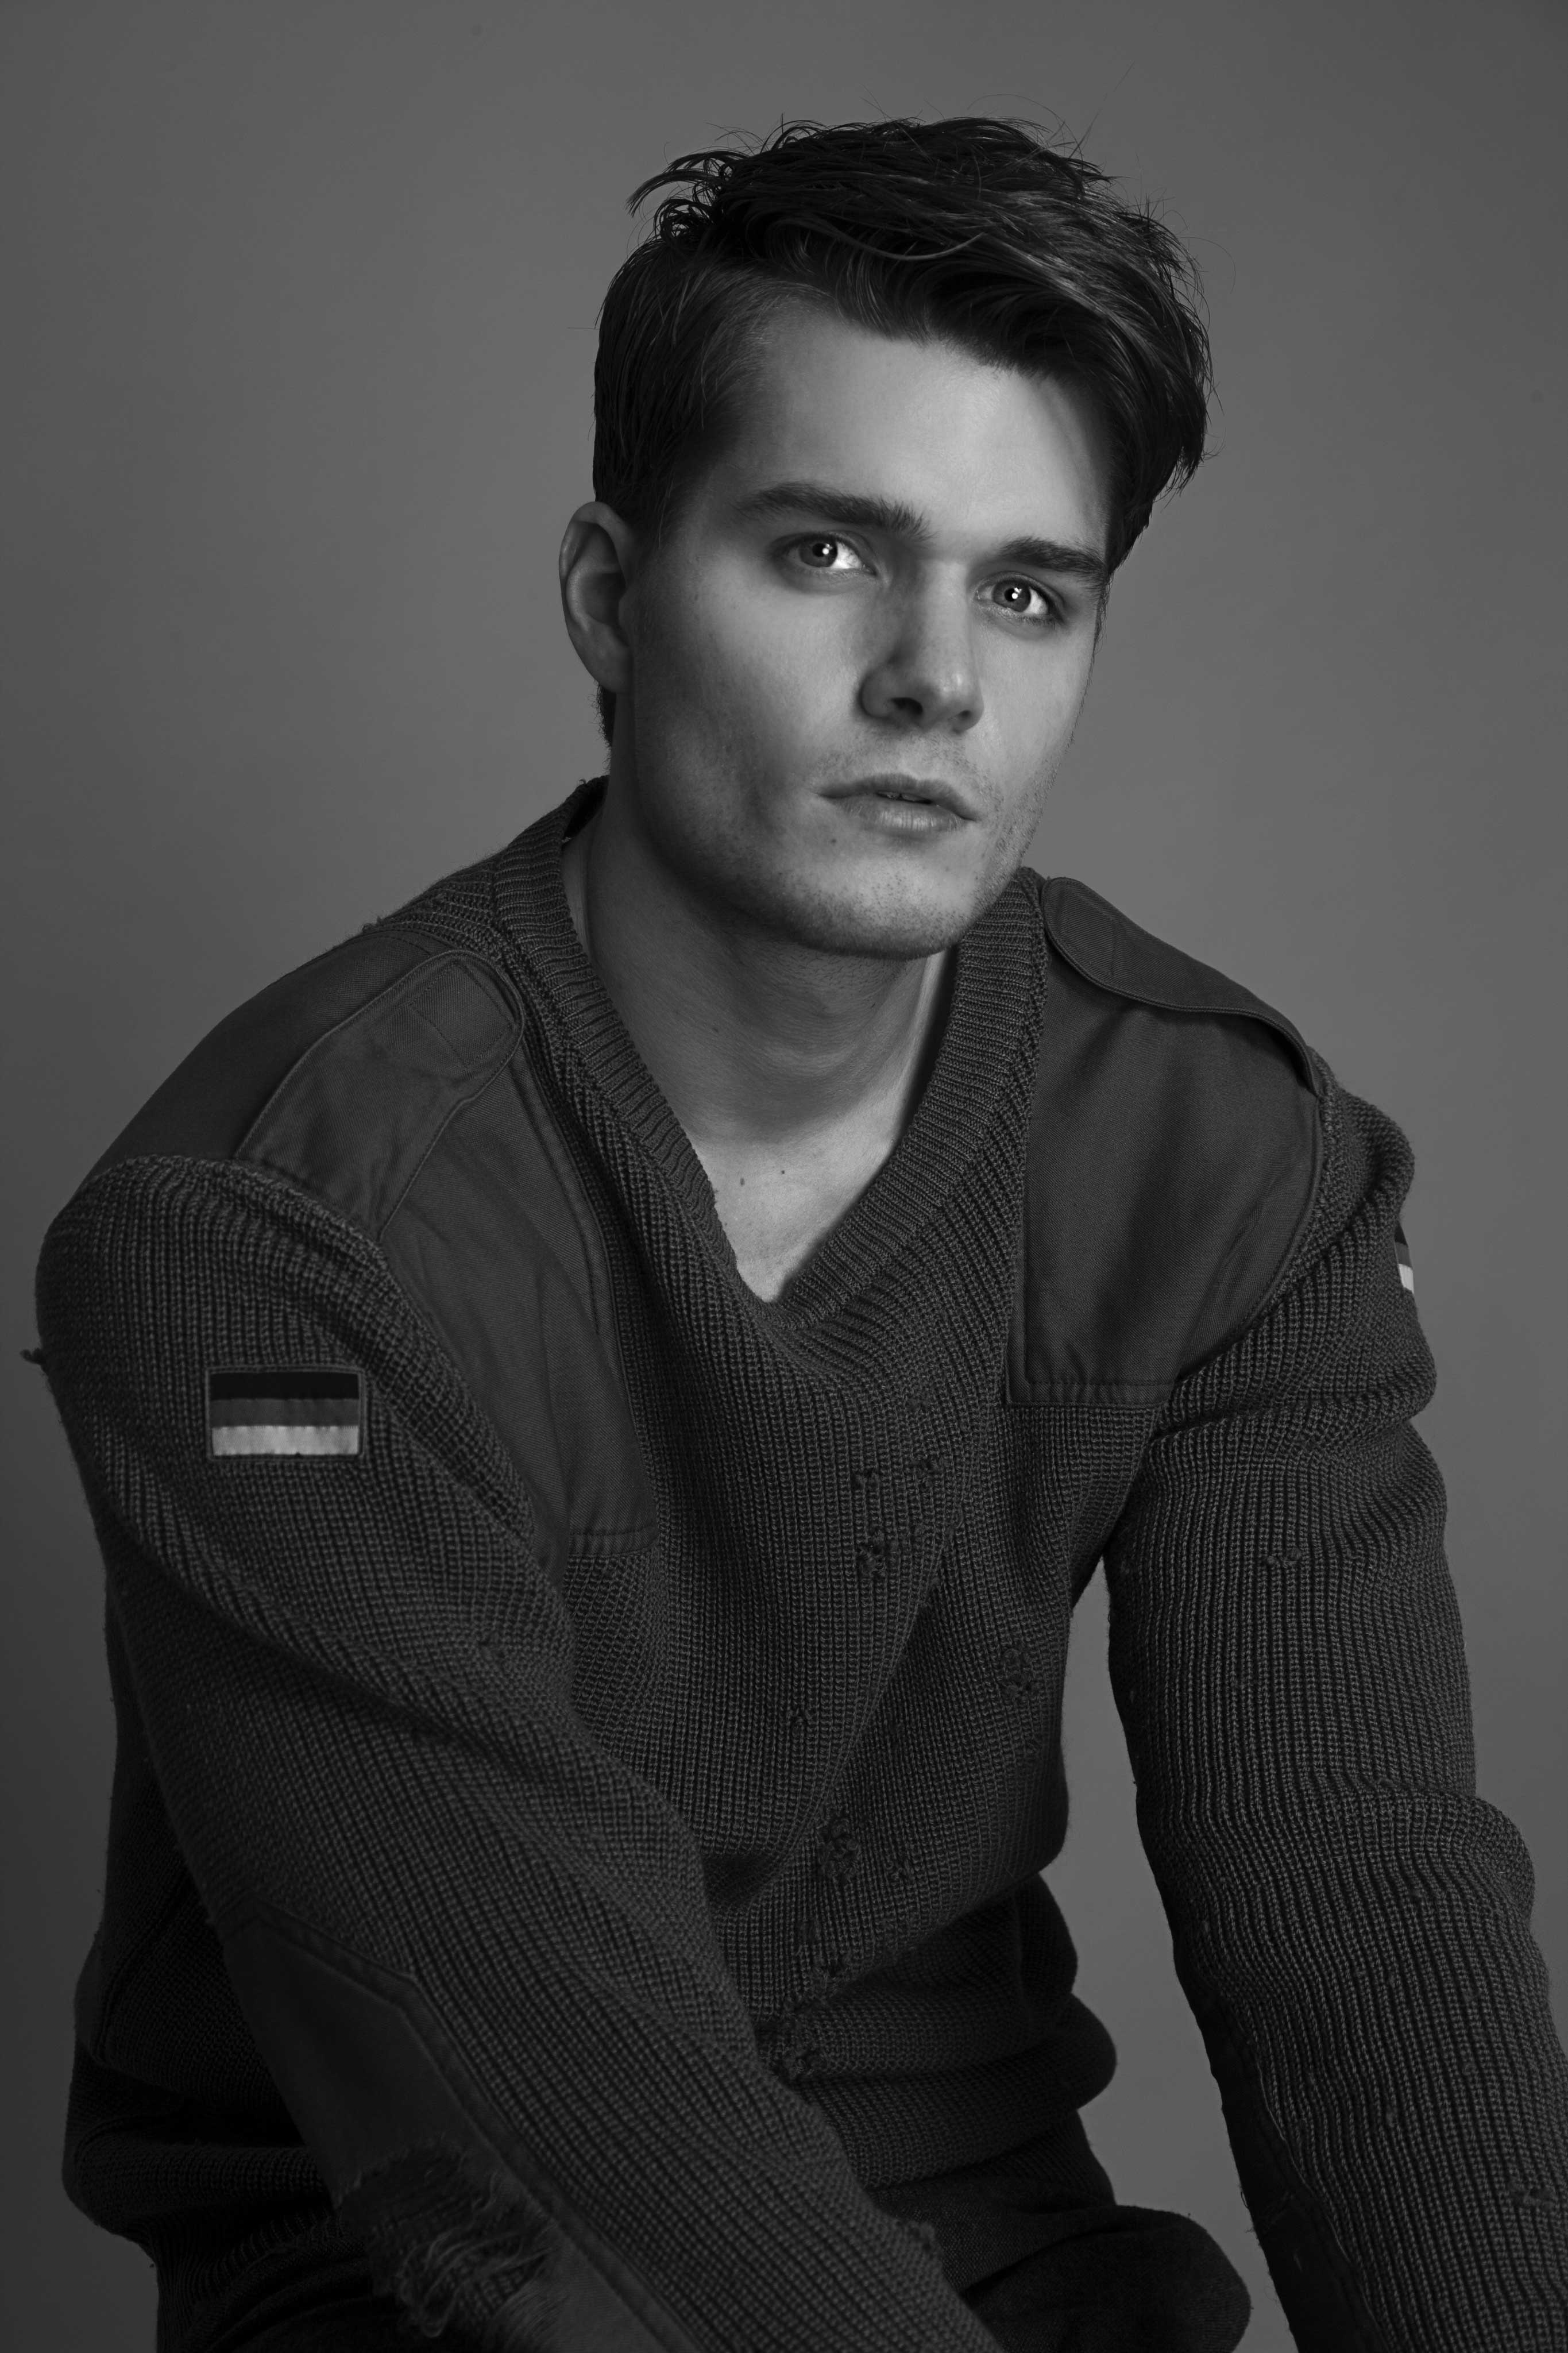 Dominik Persy